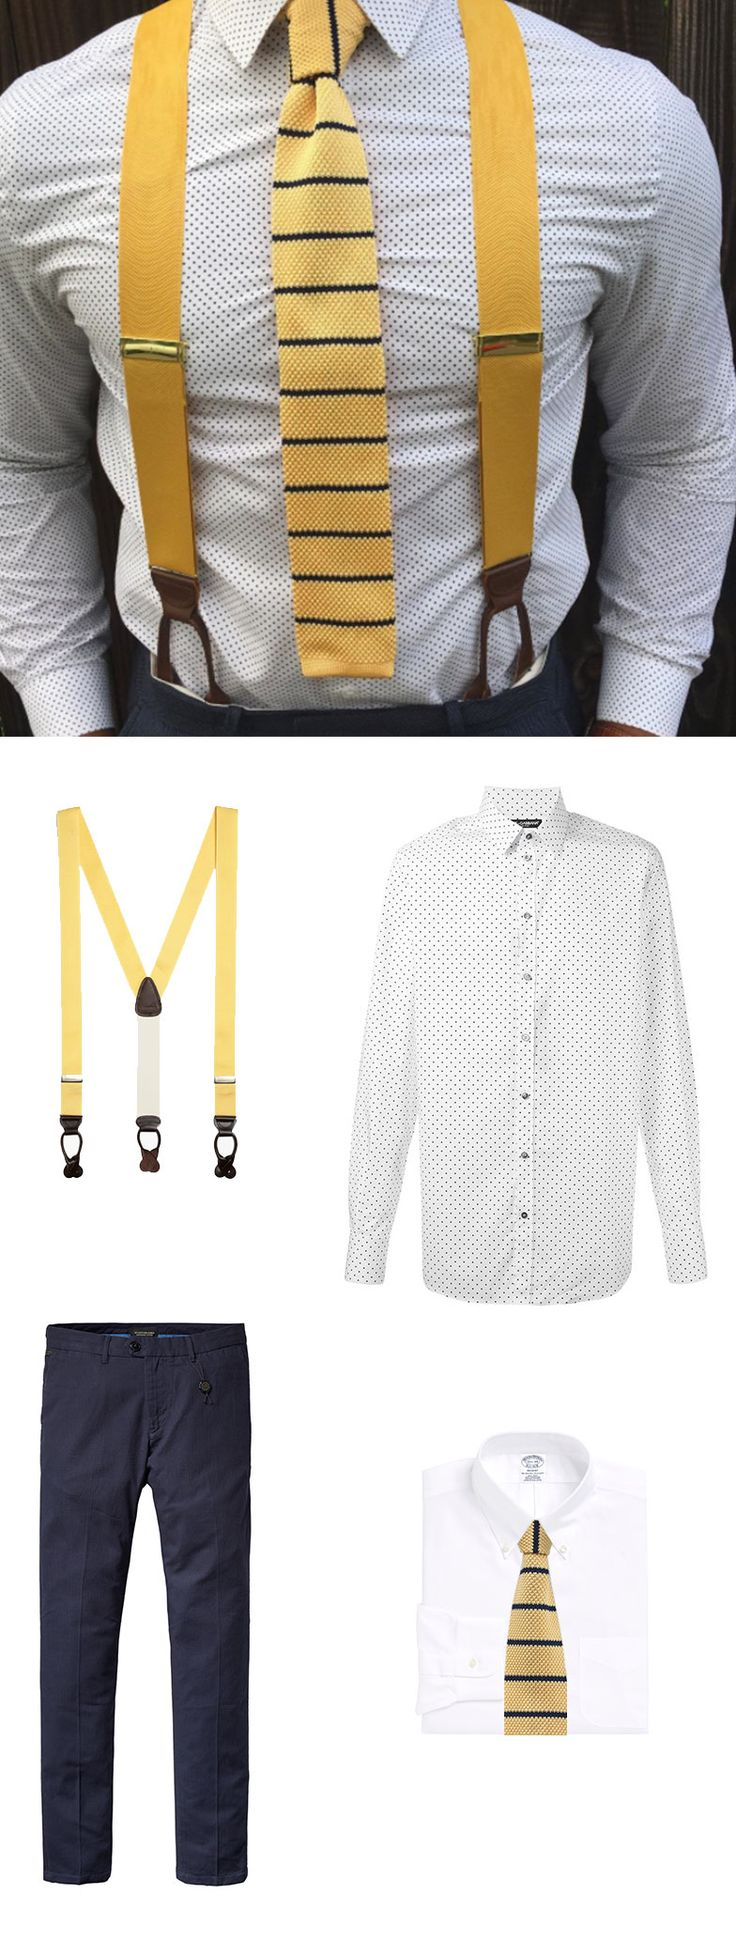 Best 25+ Knit tie ideas on Pinterest | Shirt and tie ...